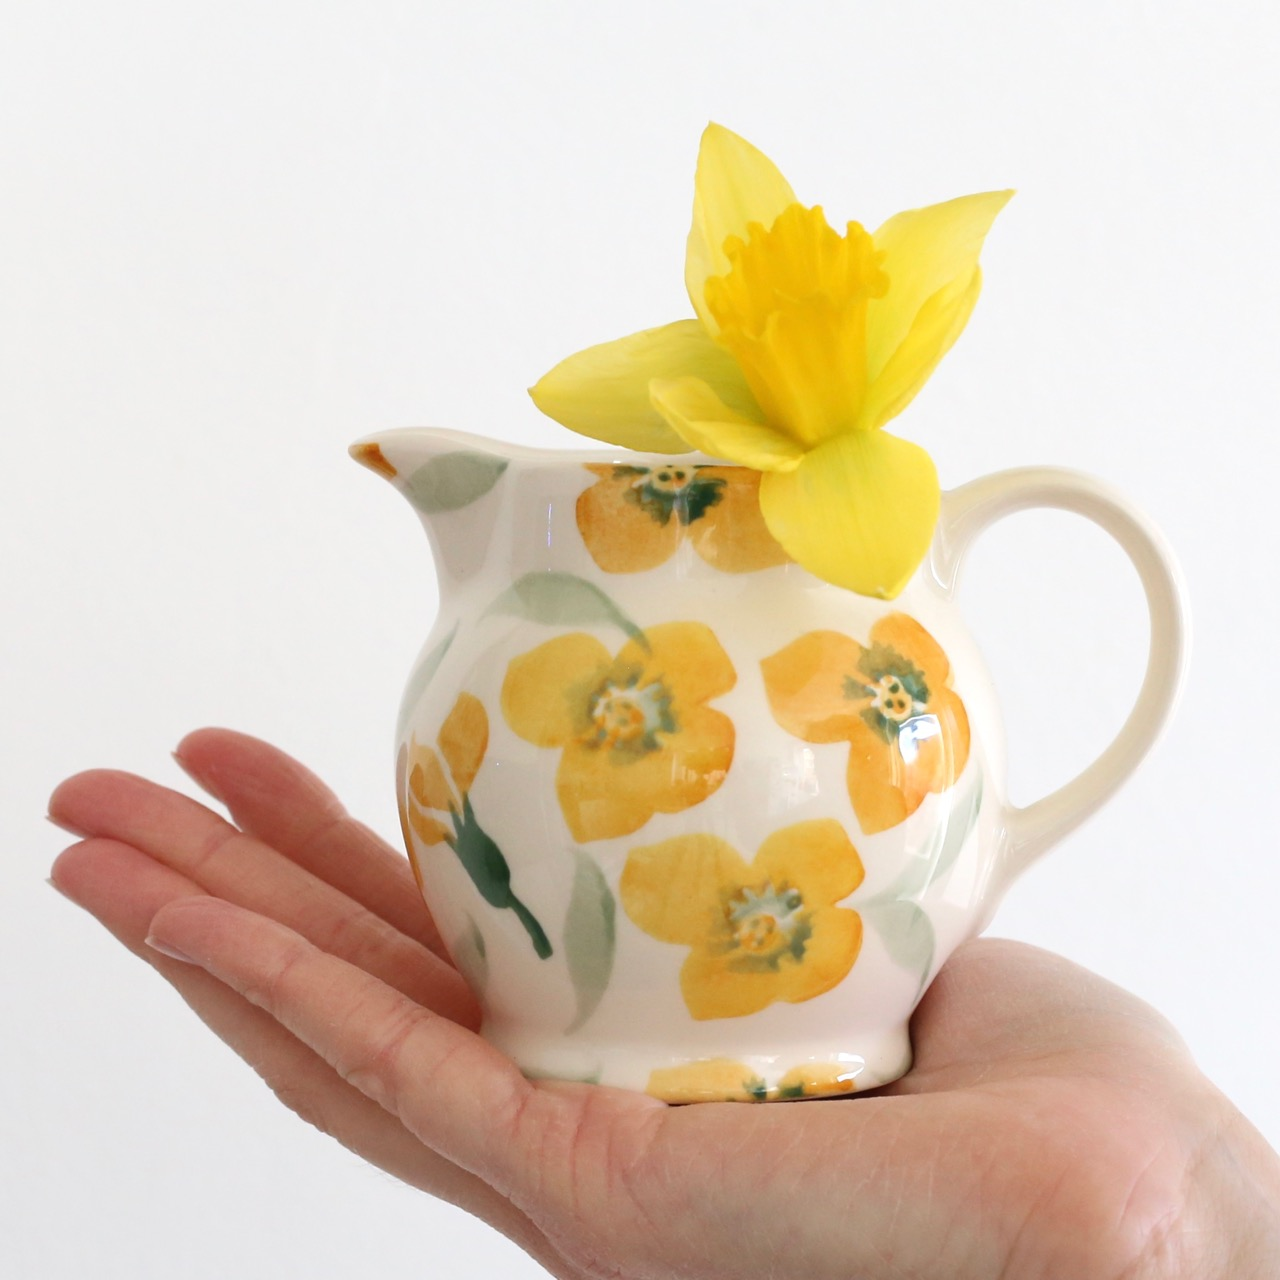 Daffodils in Emma Bridgewater jug